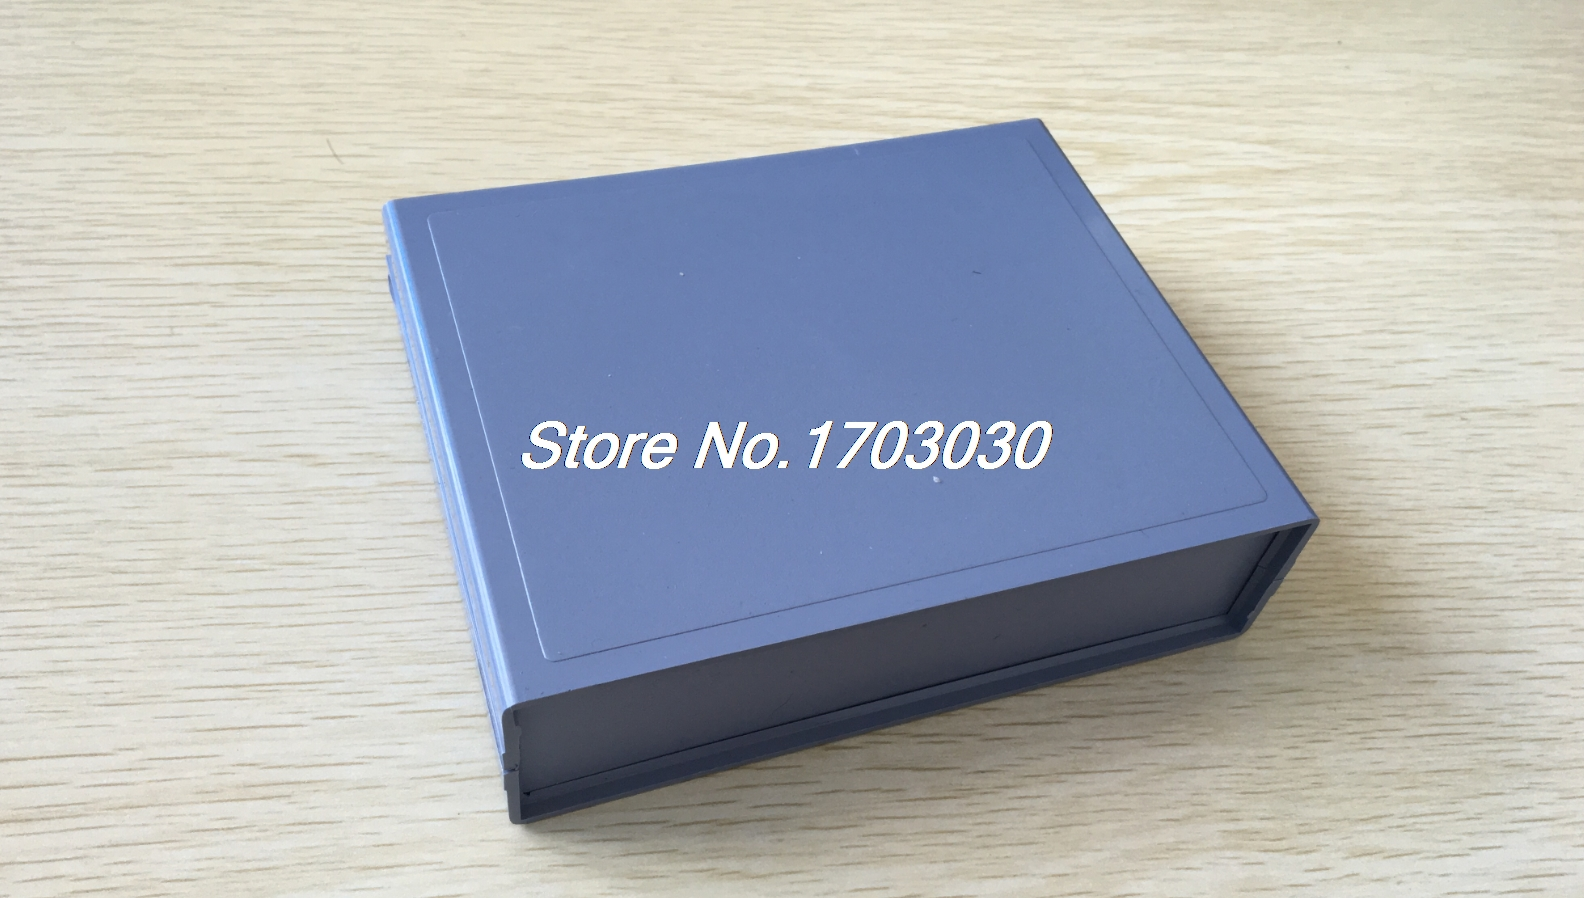 150mm x 120mm x 40mm Removable Rectangle Shape Plastic Junction Box Case